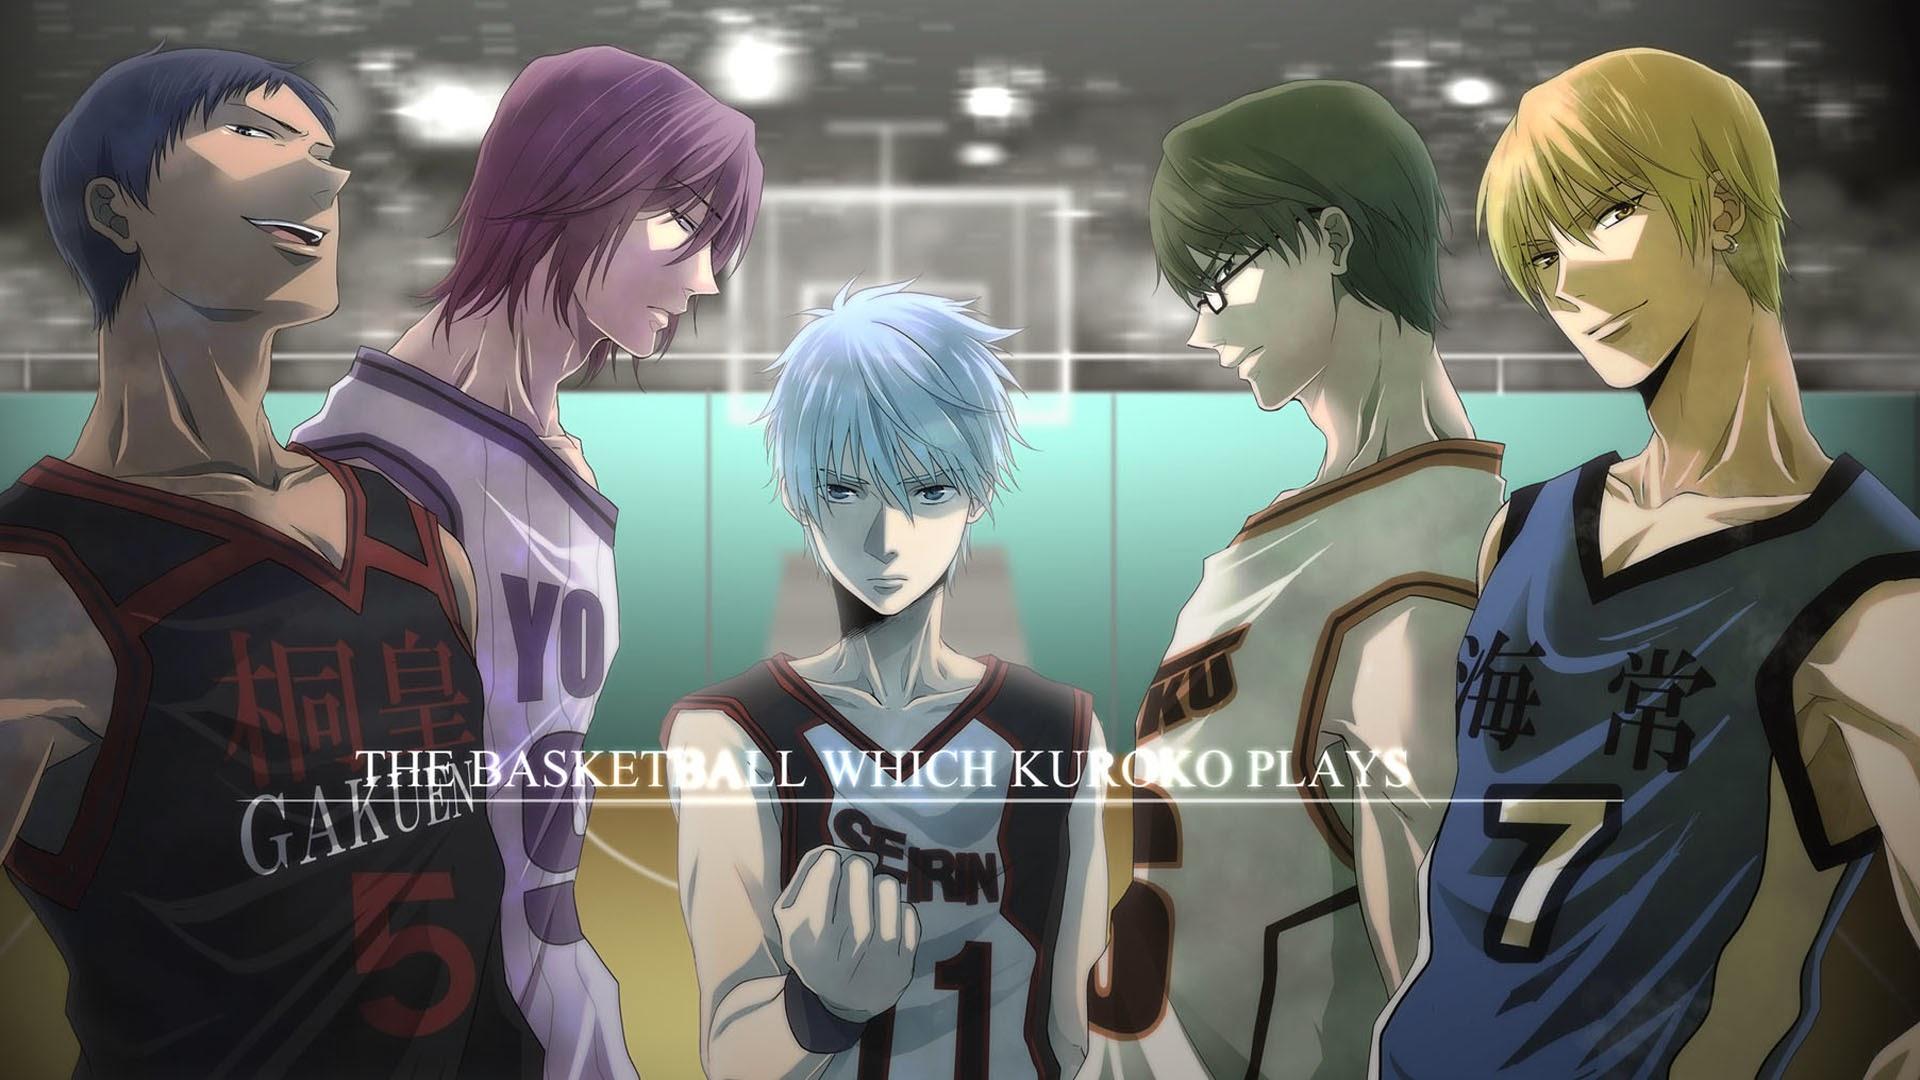 The Basketball Which Kuroko Plays A114 HD Wallpaper